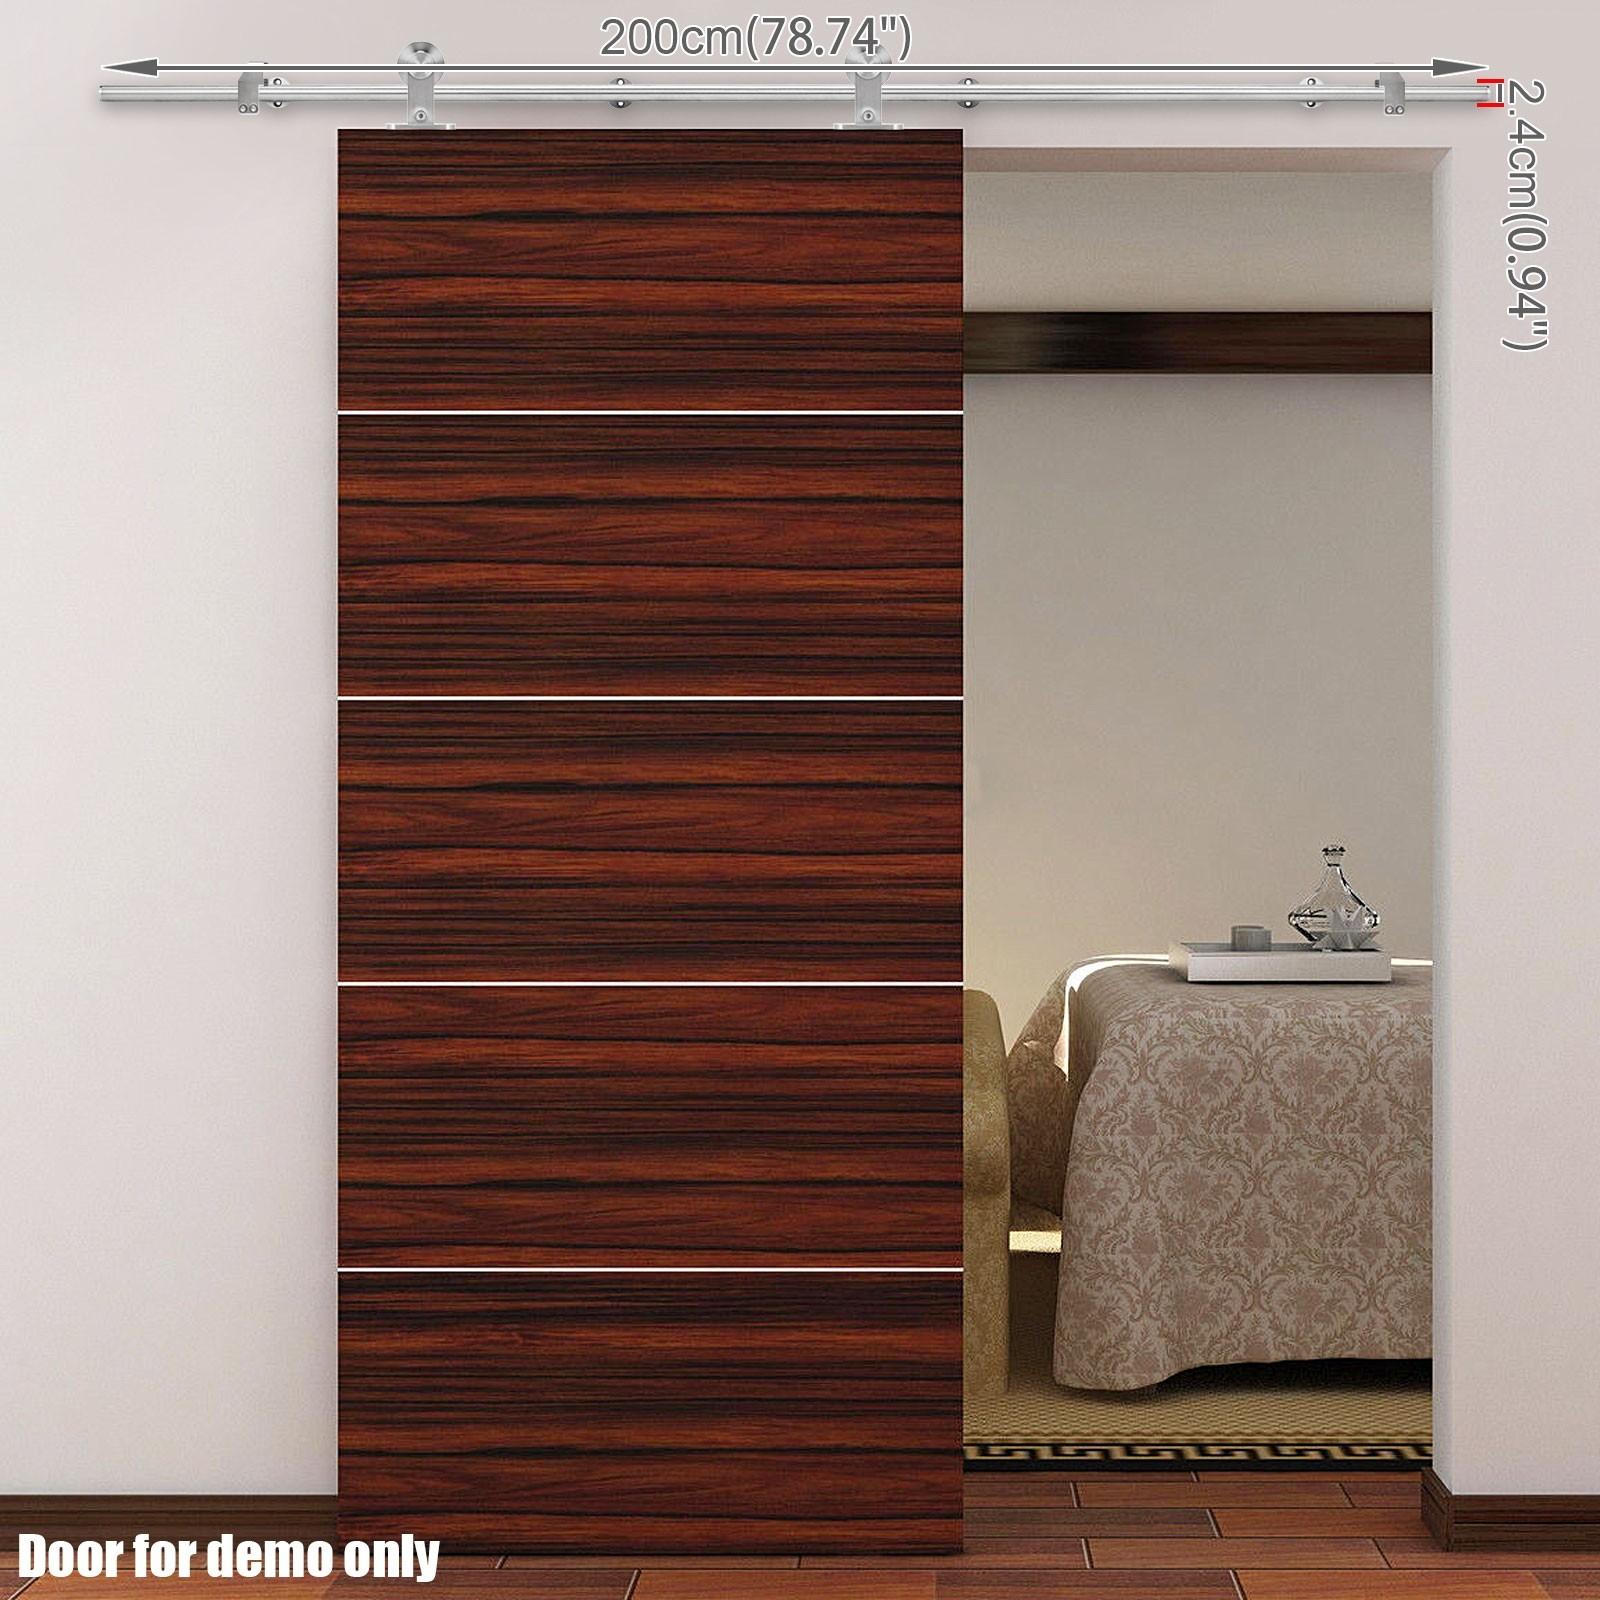 20 Home Offices With Sliding Barn Doors: Voilamart Sliding Barn Door Track Hardware Set 2m High